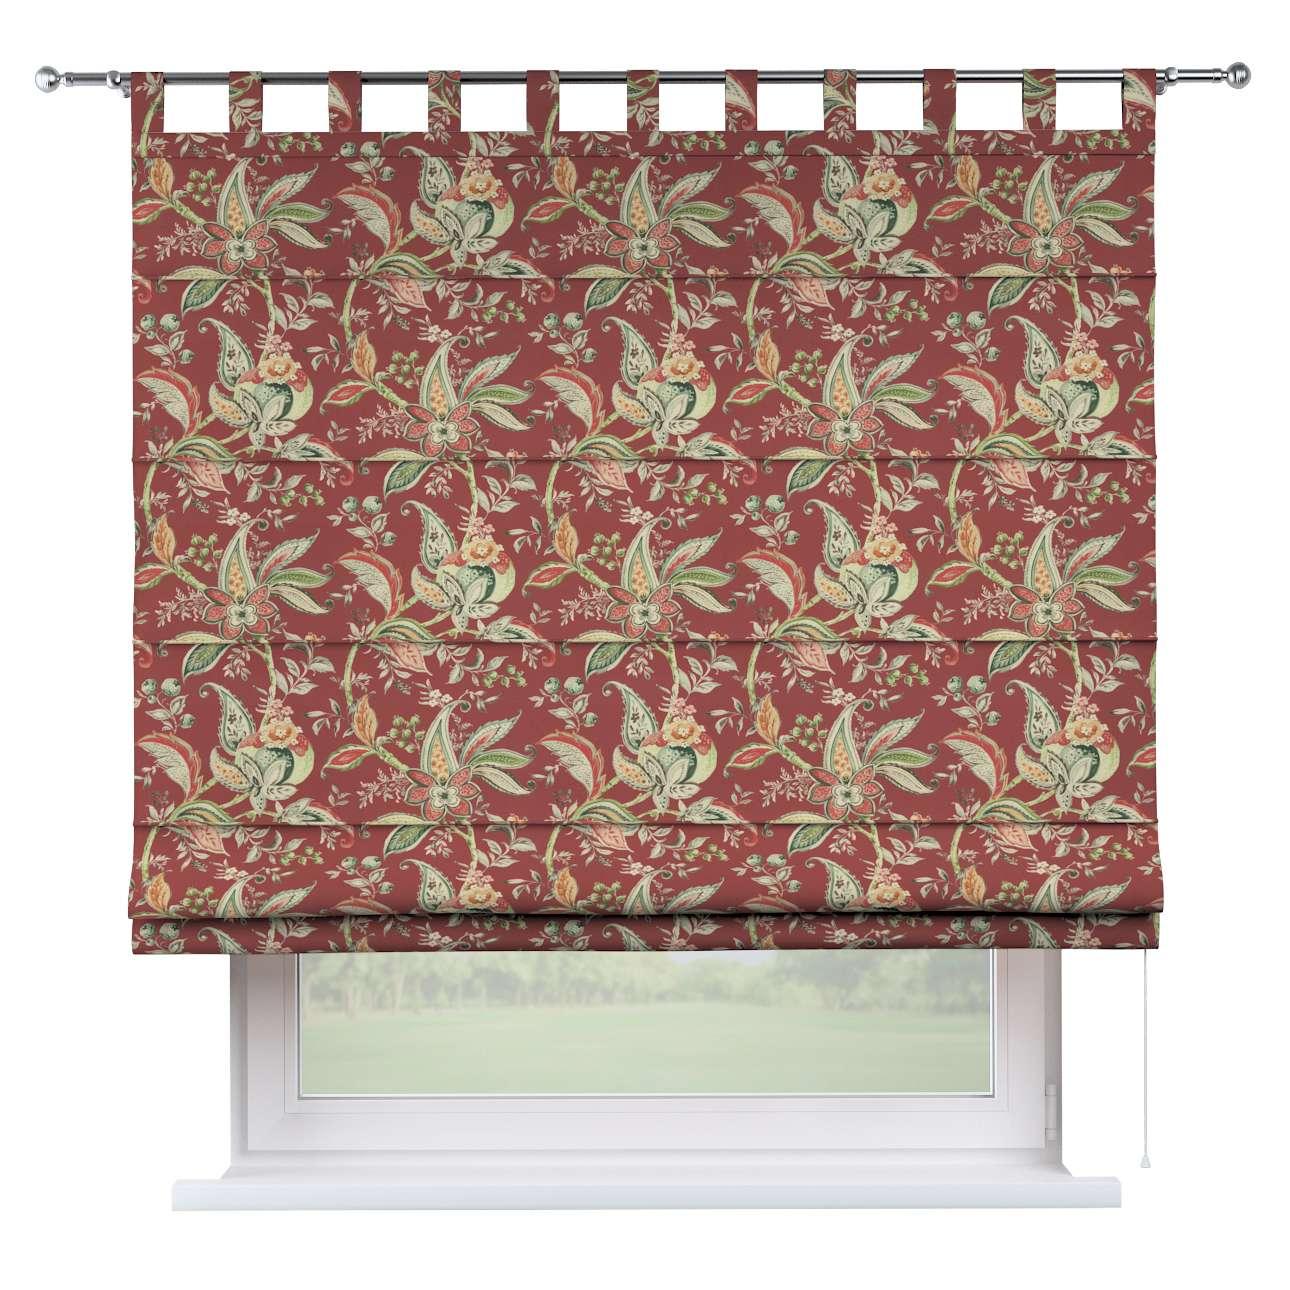 raffrollo verona rot 80 170 cm gardenia modecentren imc. Black Bedroom Furniture Sets. Home Design Ideas